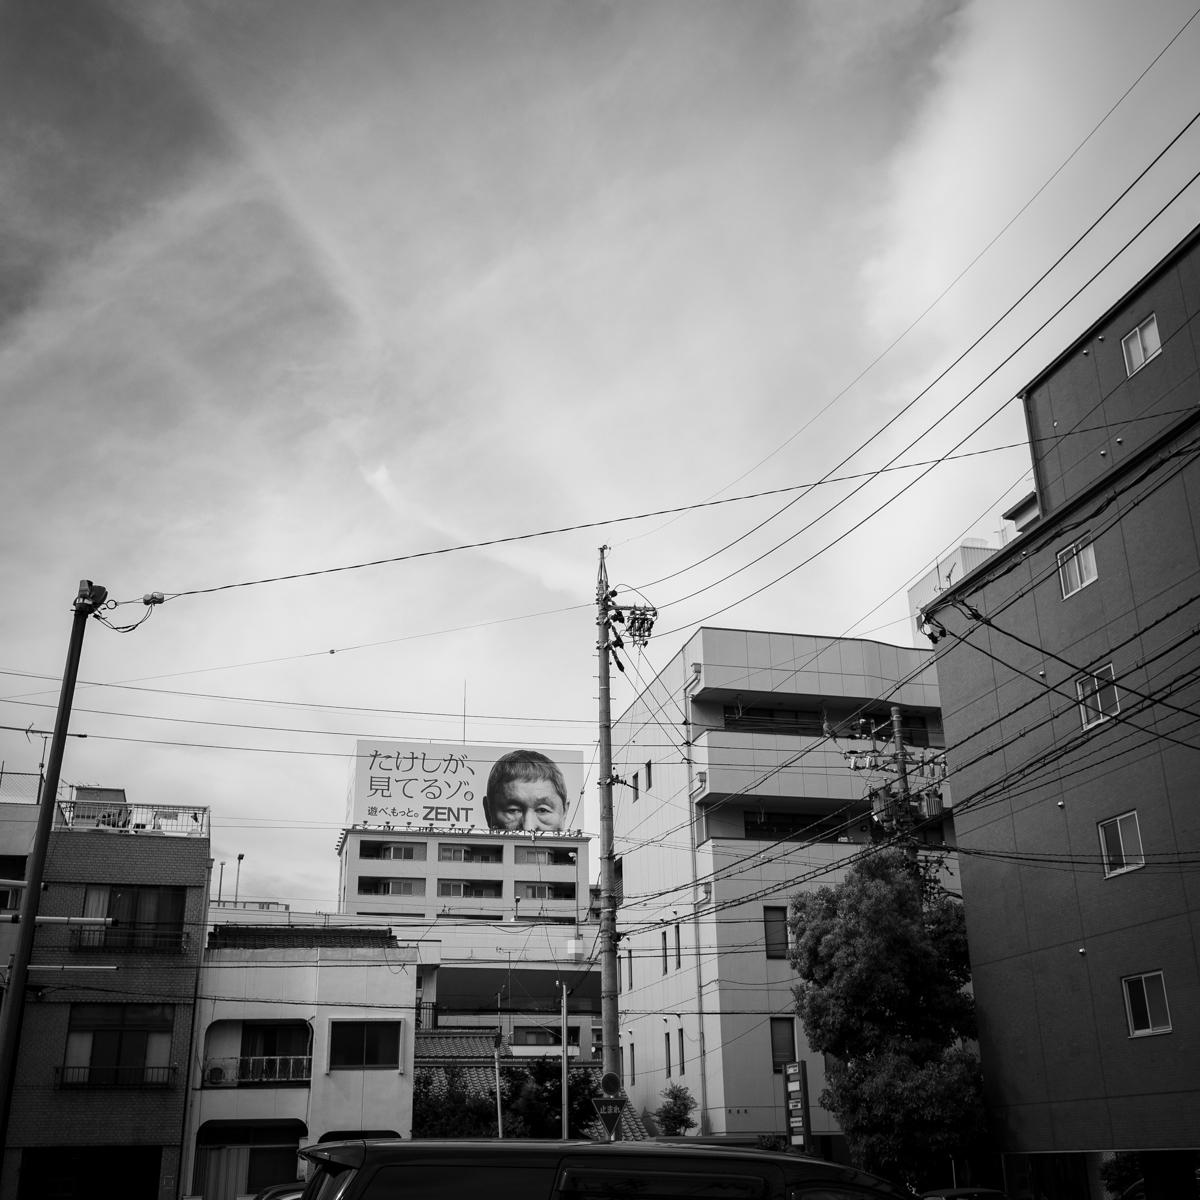 f:id:nagoya-meshi:20190531231141j:plain